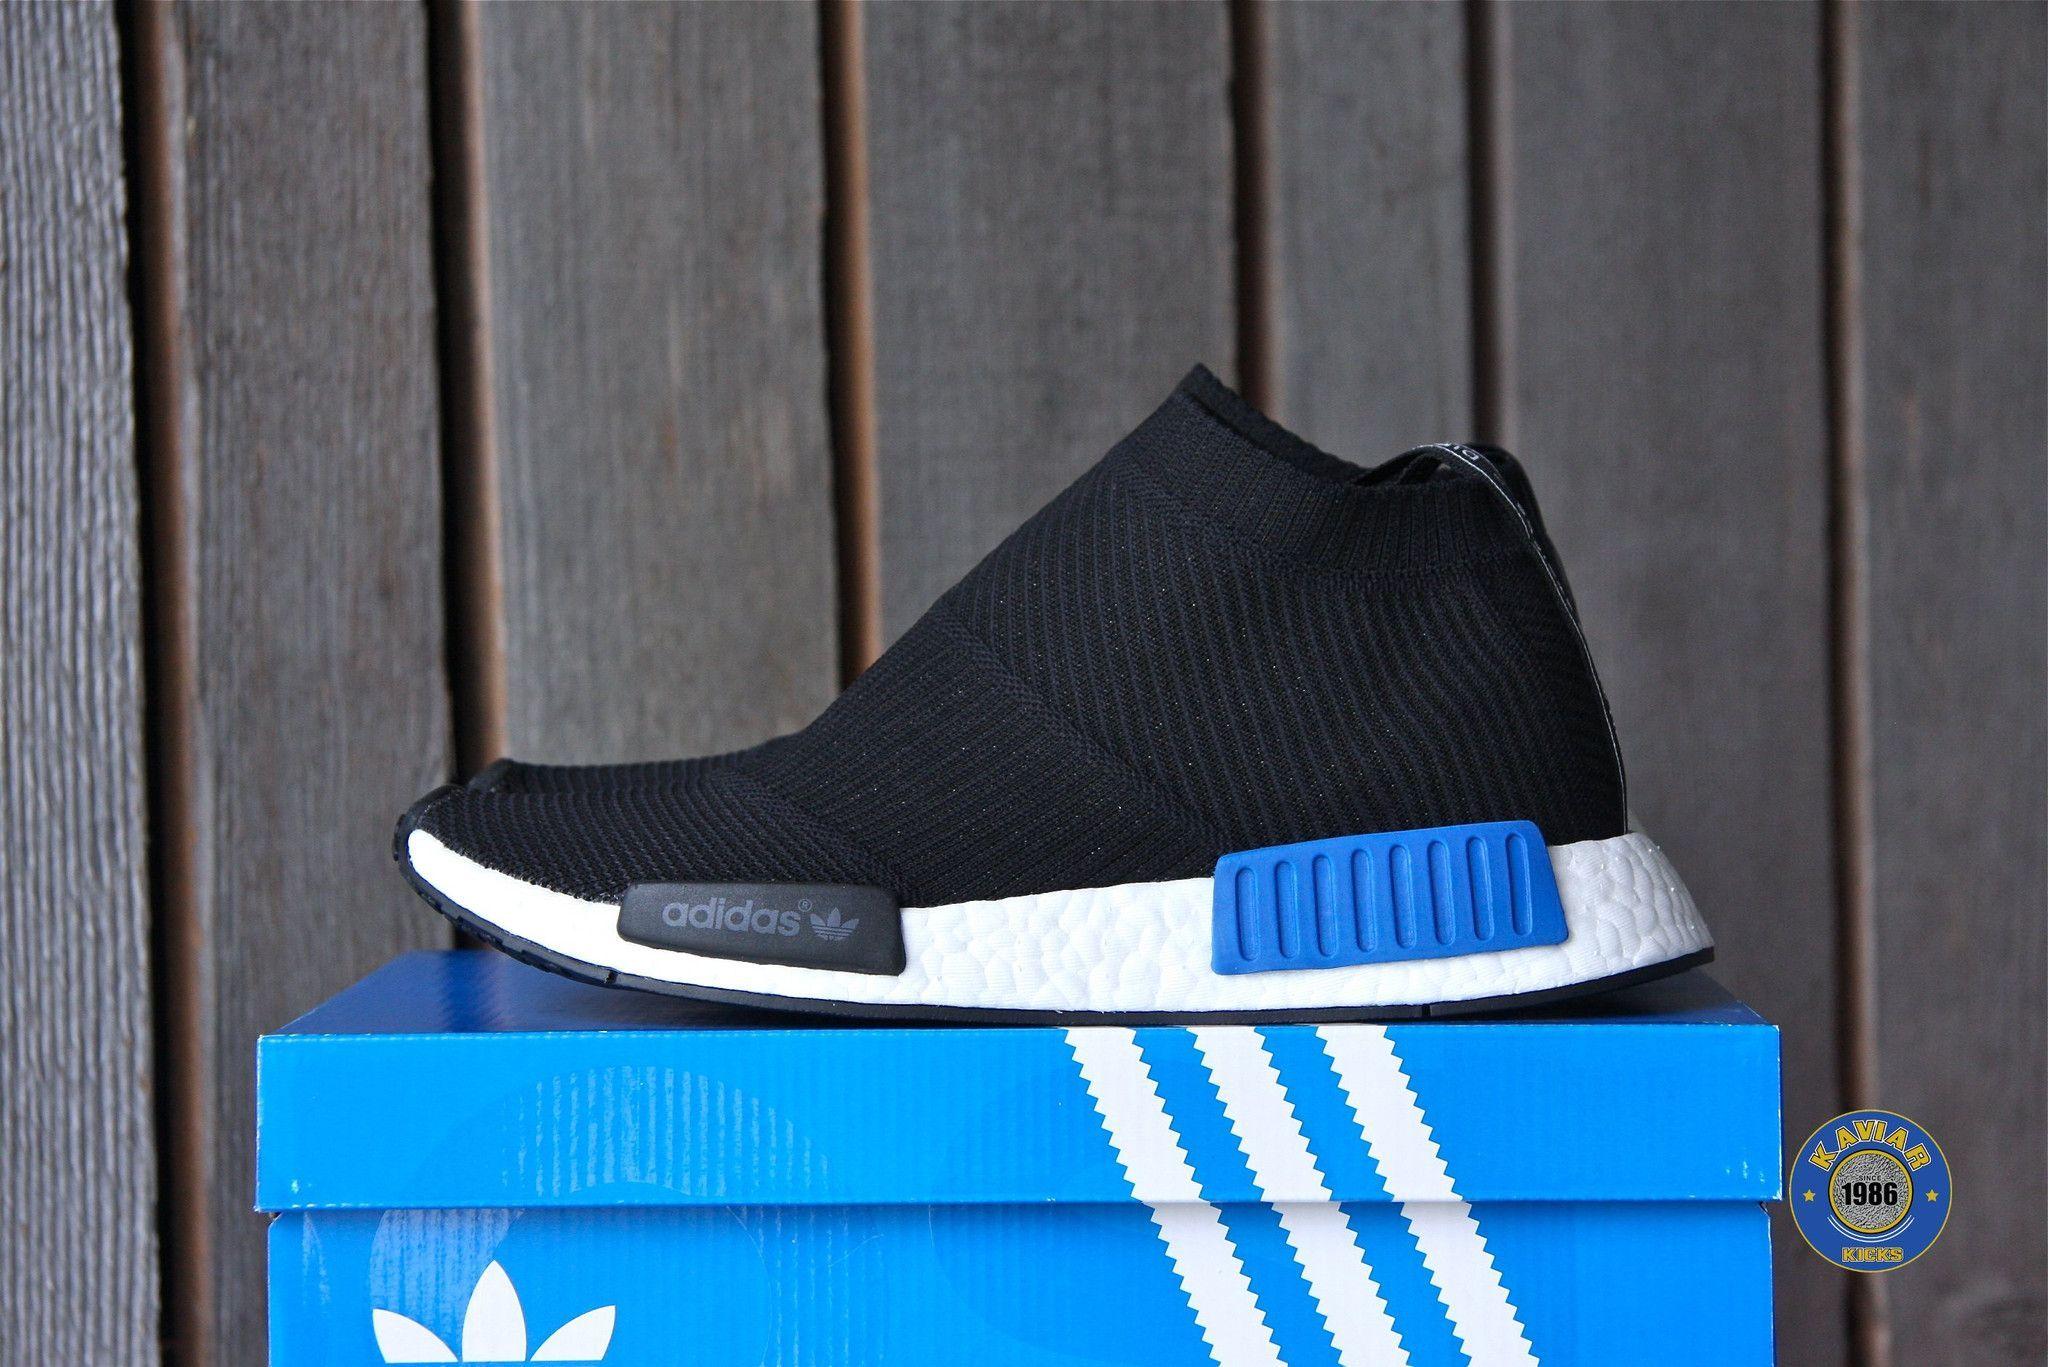 adidas nmd c1 Blue